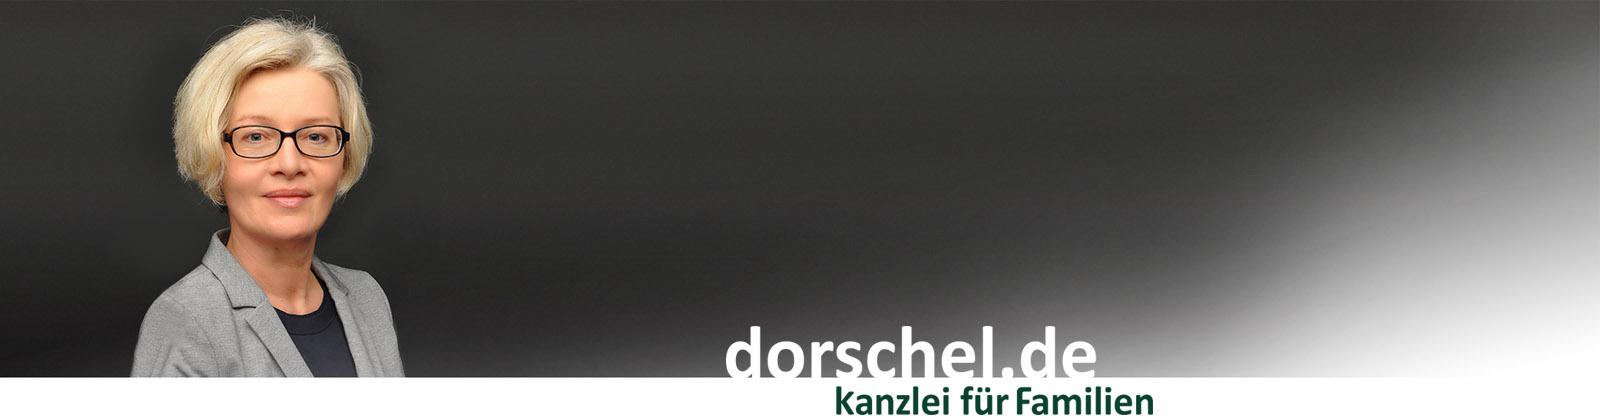 Susanne Dorschel